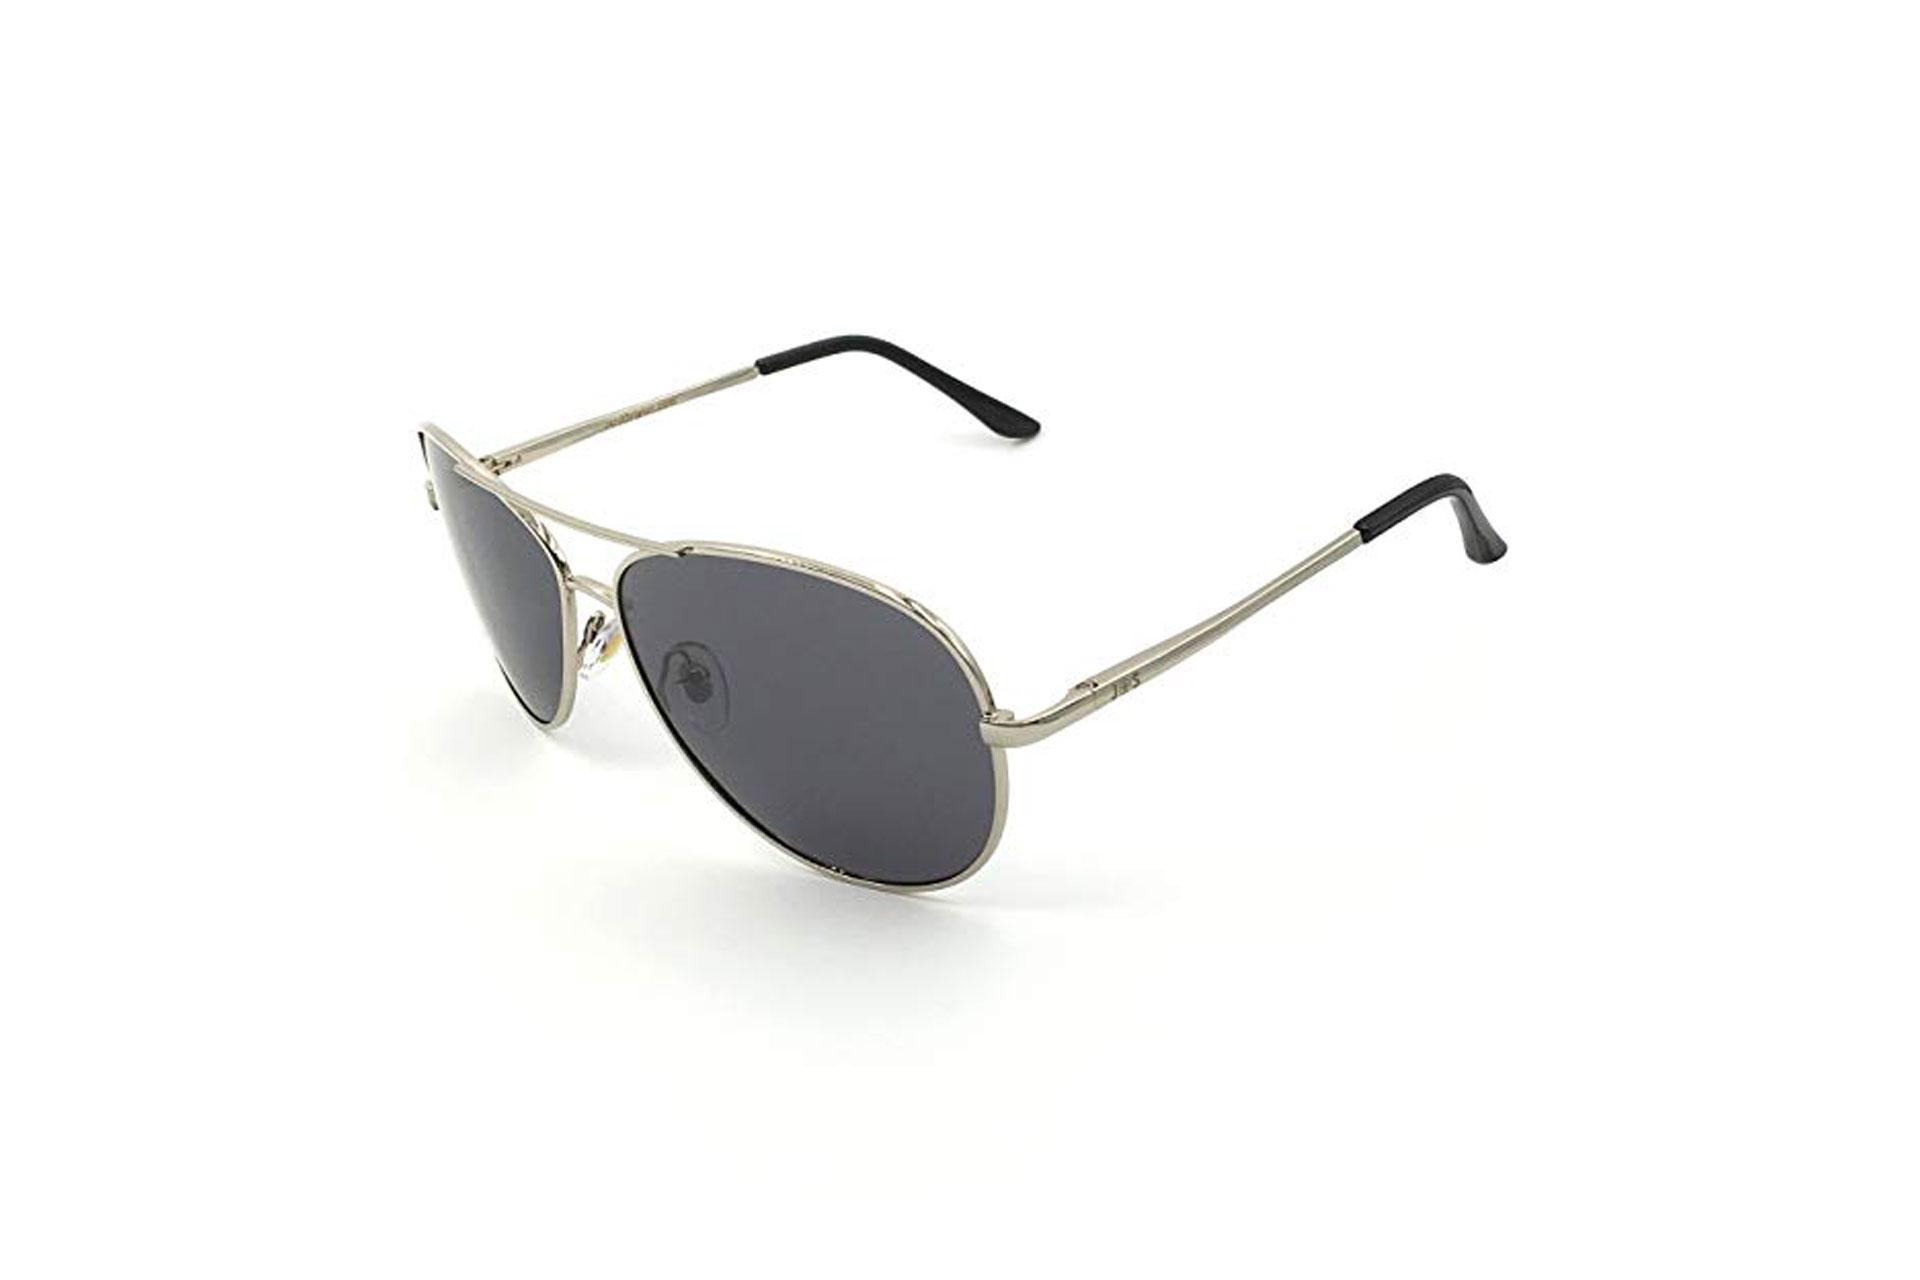 Aviator Sunglasses; Courtesy of Amazon